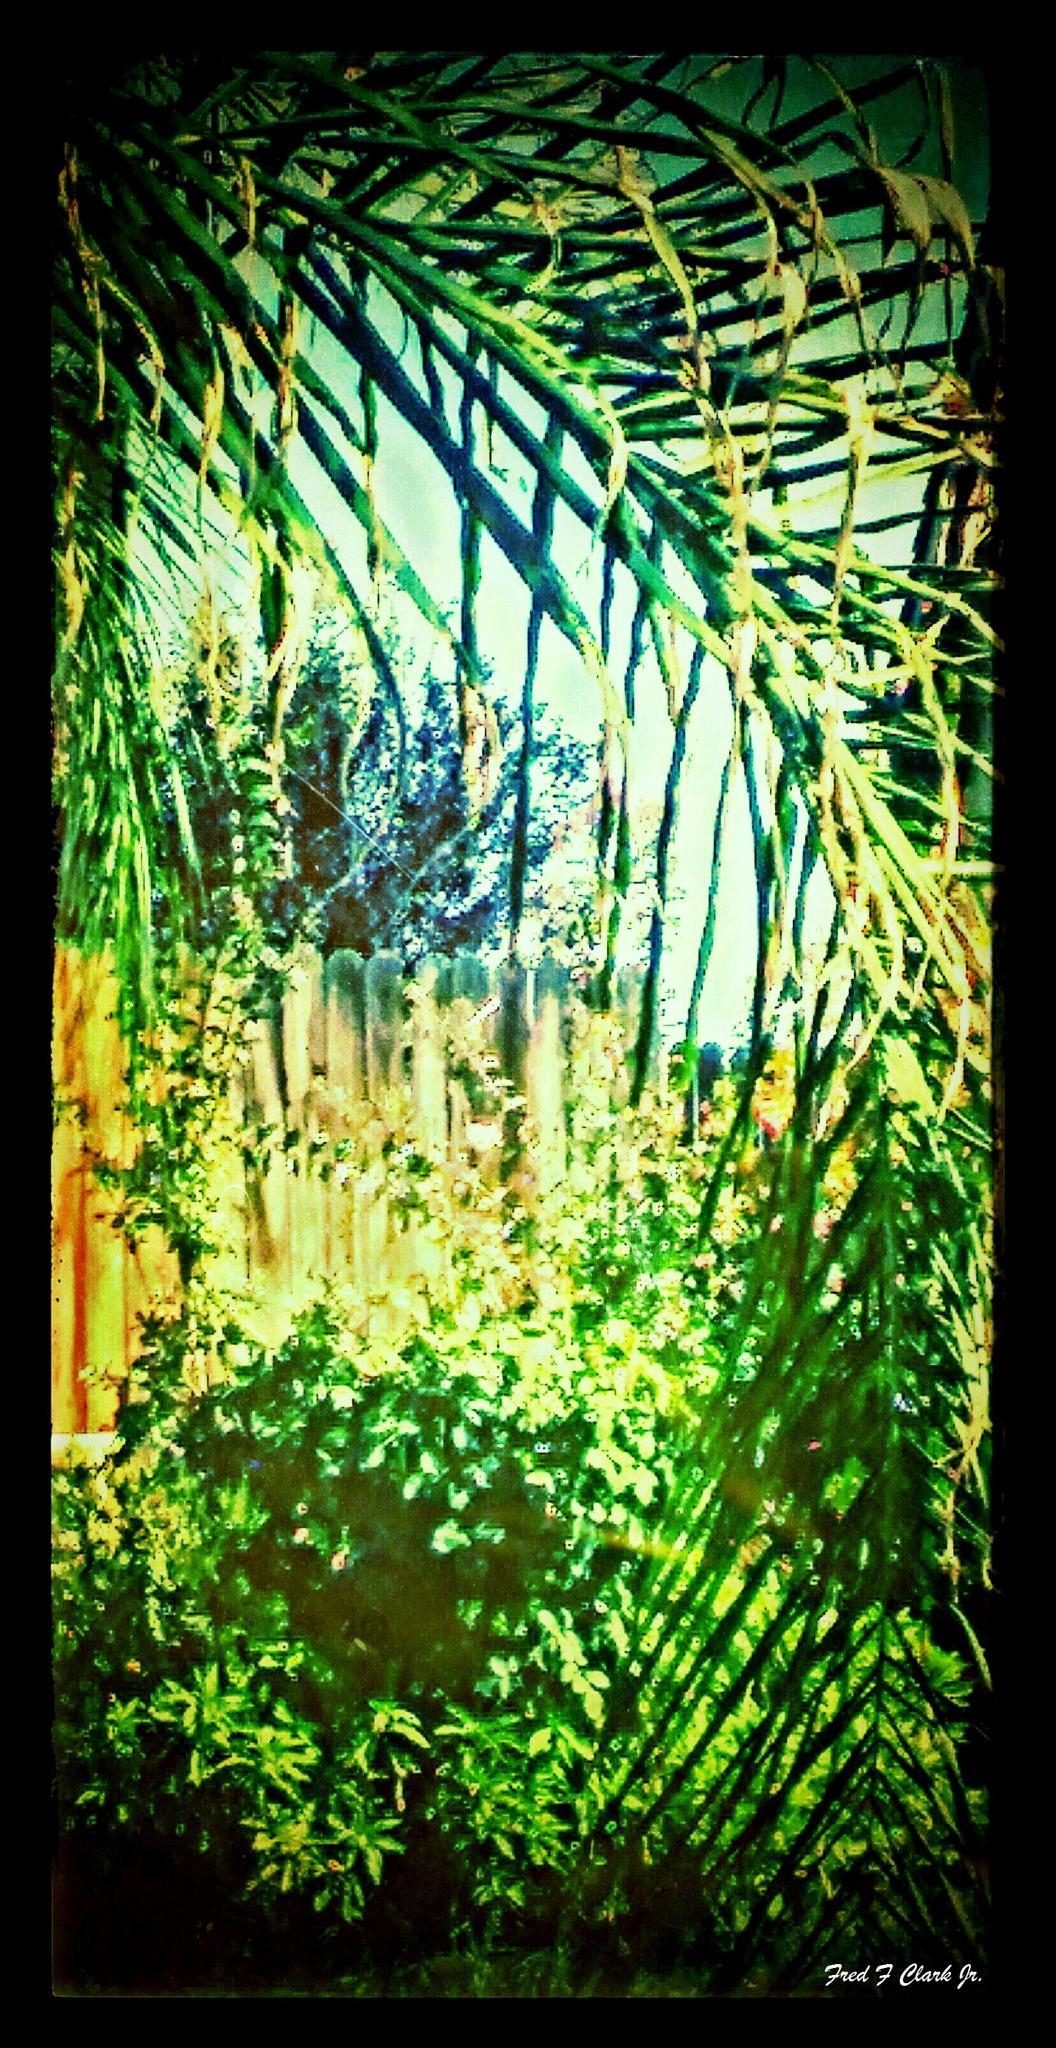 My Neighbor's Yard by fred.clark.359